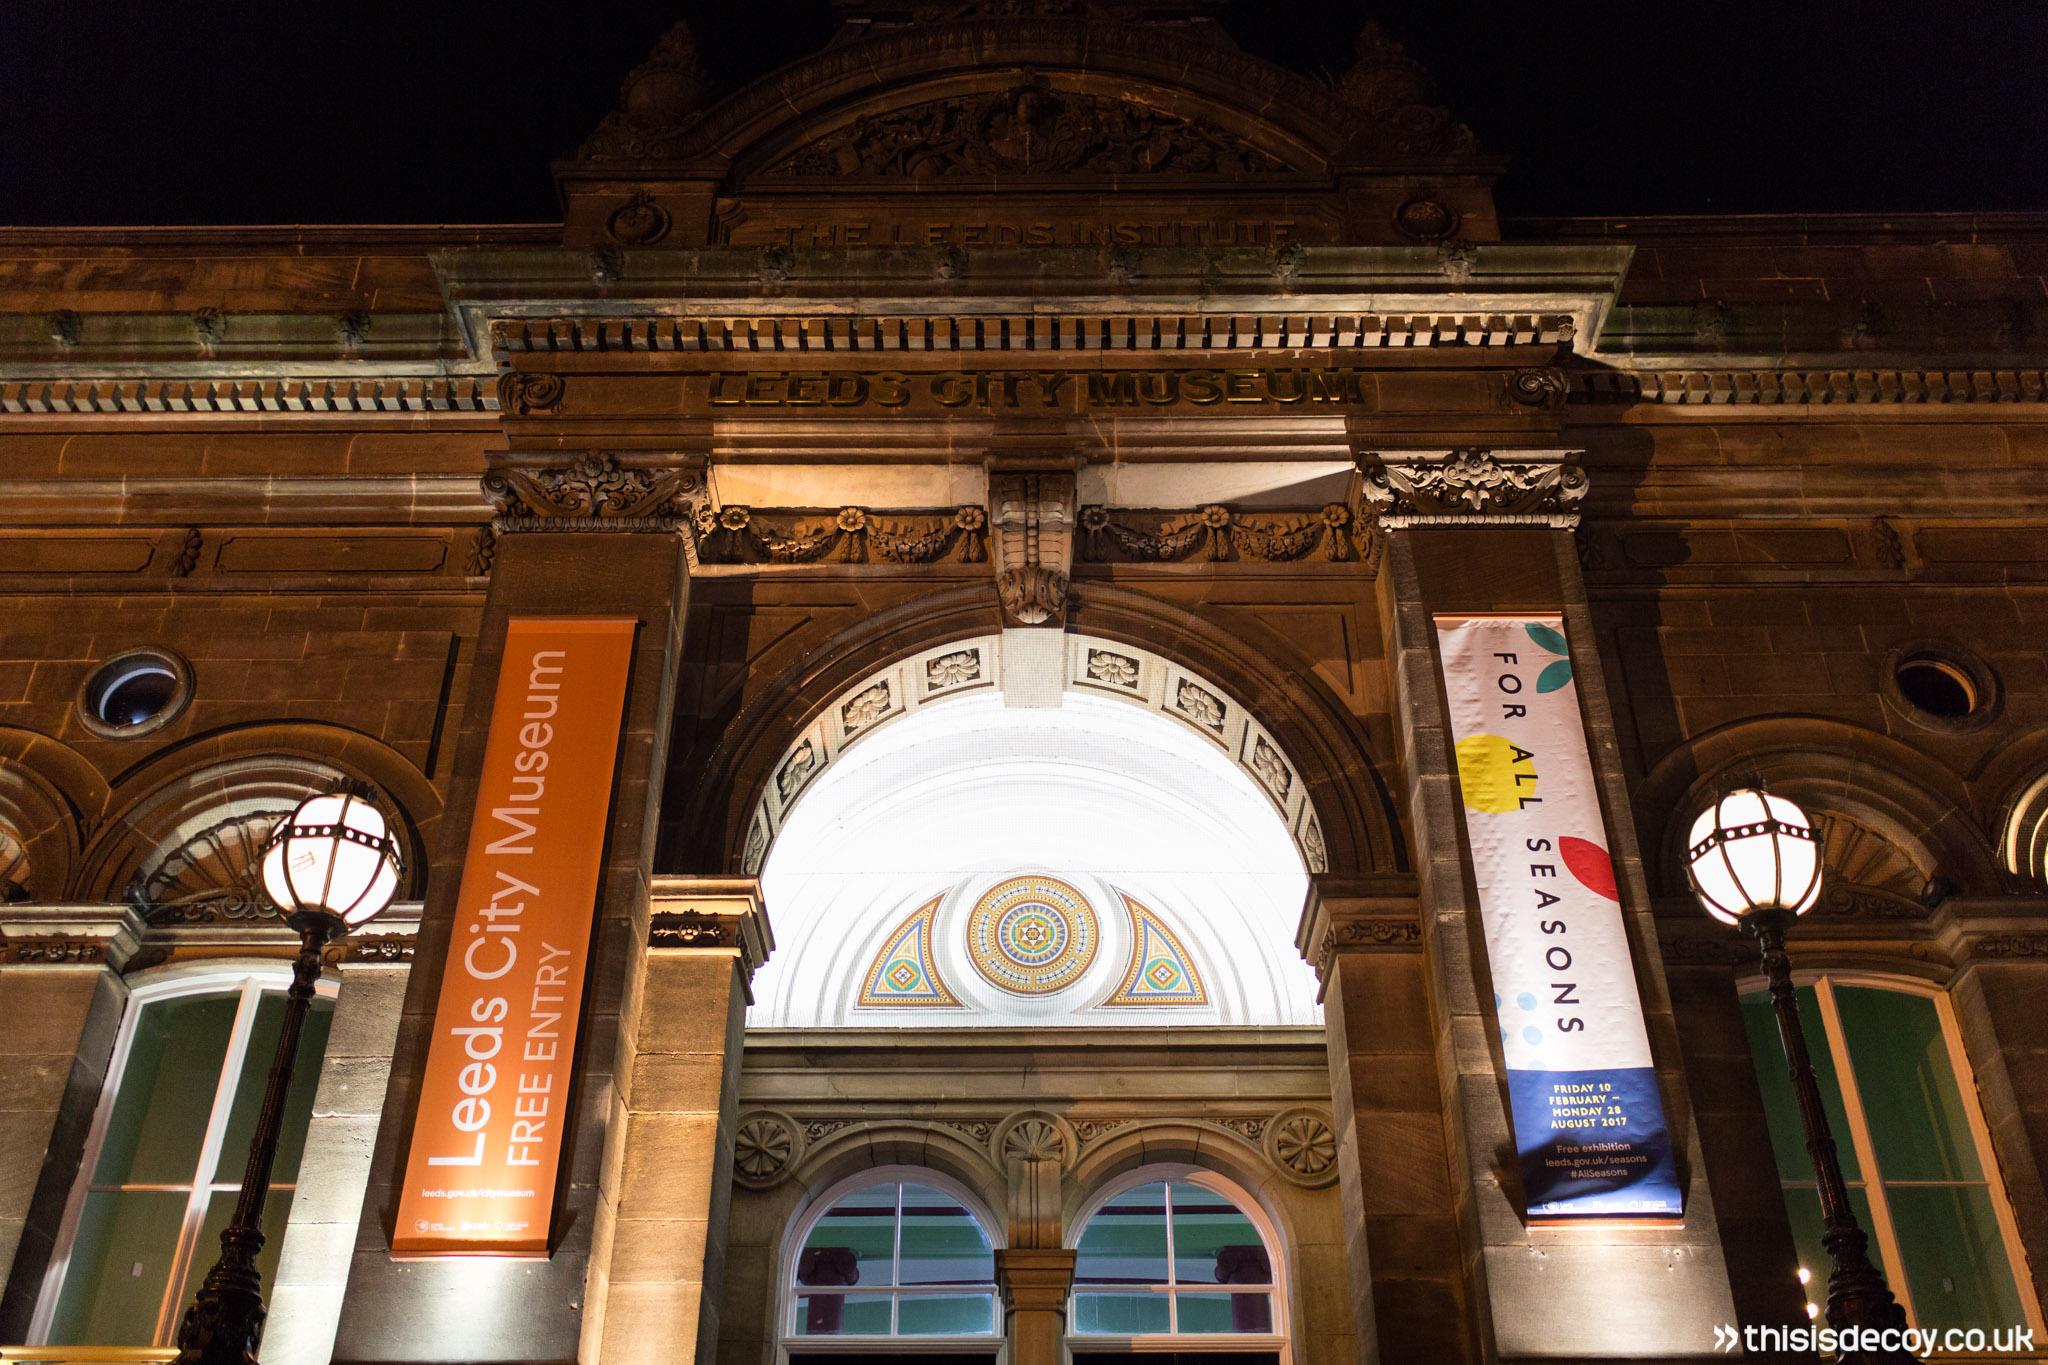 Northern Light - Bob Barker - Leeds City Museum - 20 Jan 17 - Decoy Media - 8.jpg